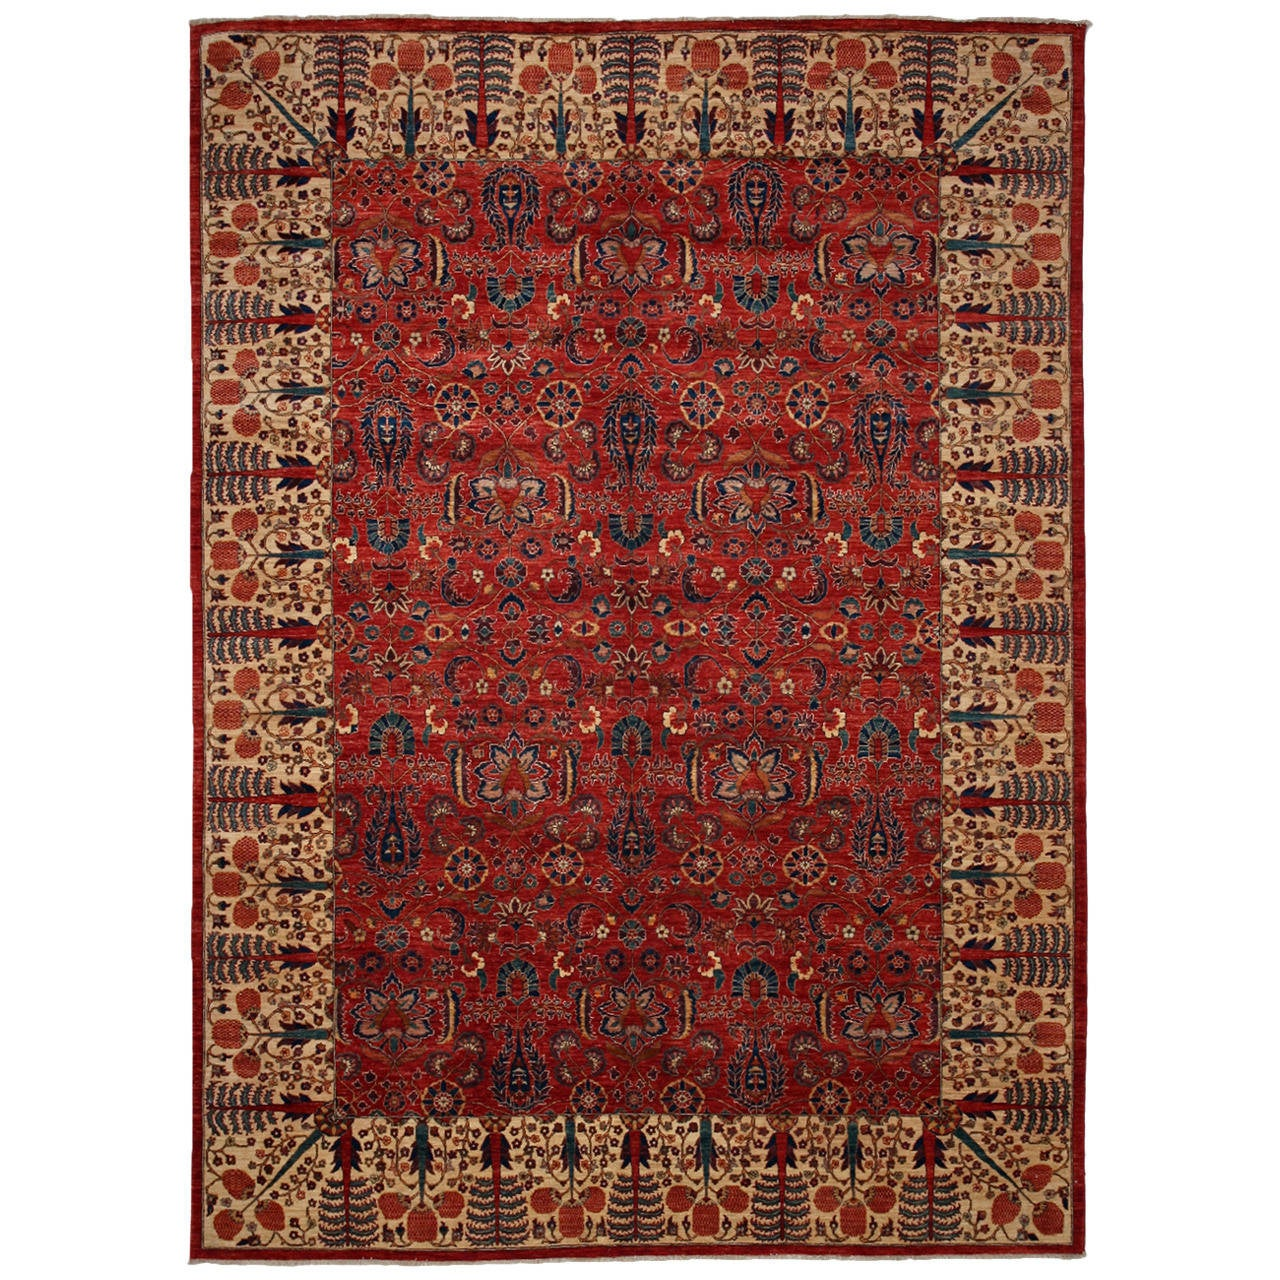 Breathtaking Large Geometric Red 10x12 Bakhtiari Persian: Ahar, Fine Oriental Rug At 1stdibs